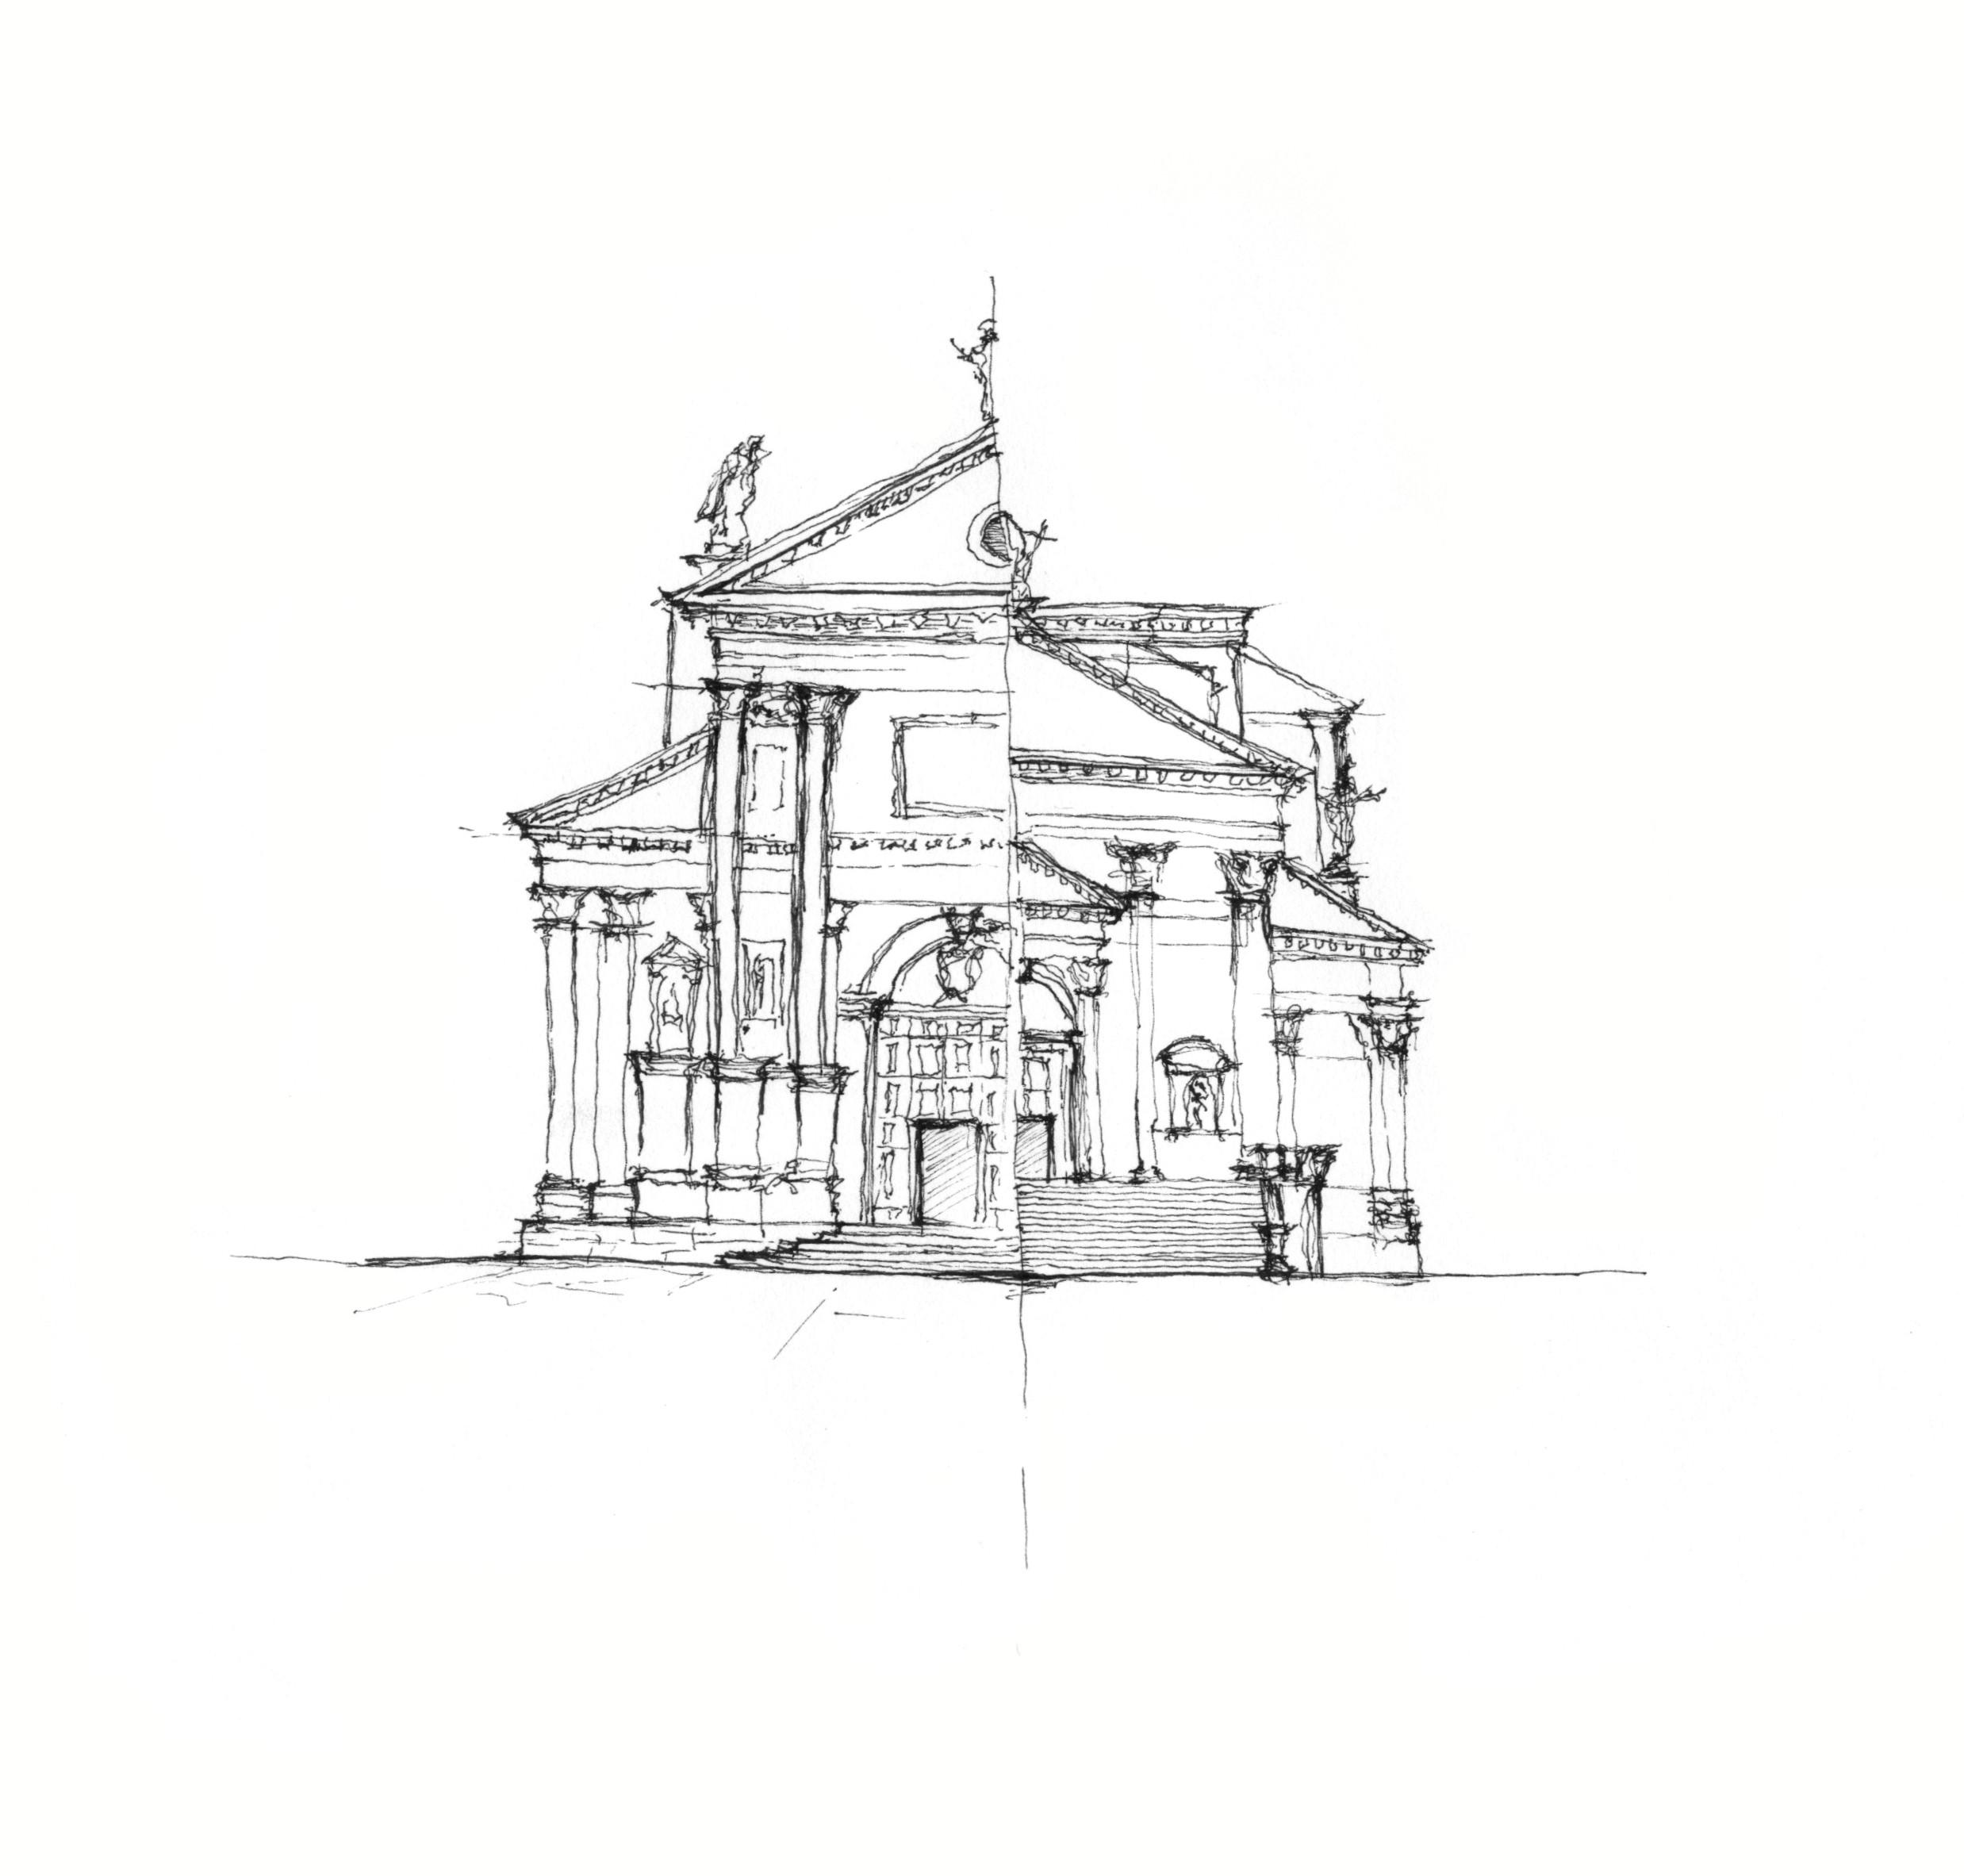 Salute Redentore - Venice